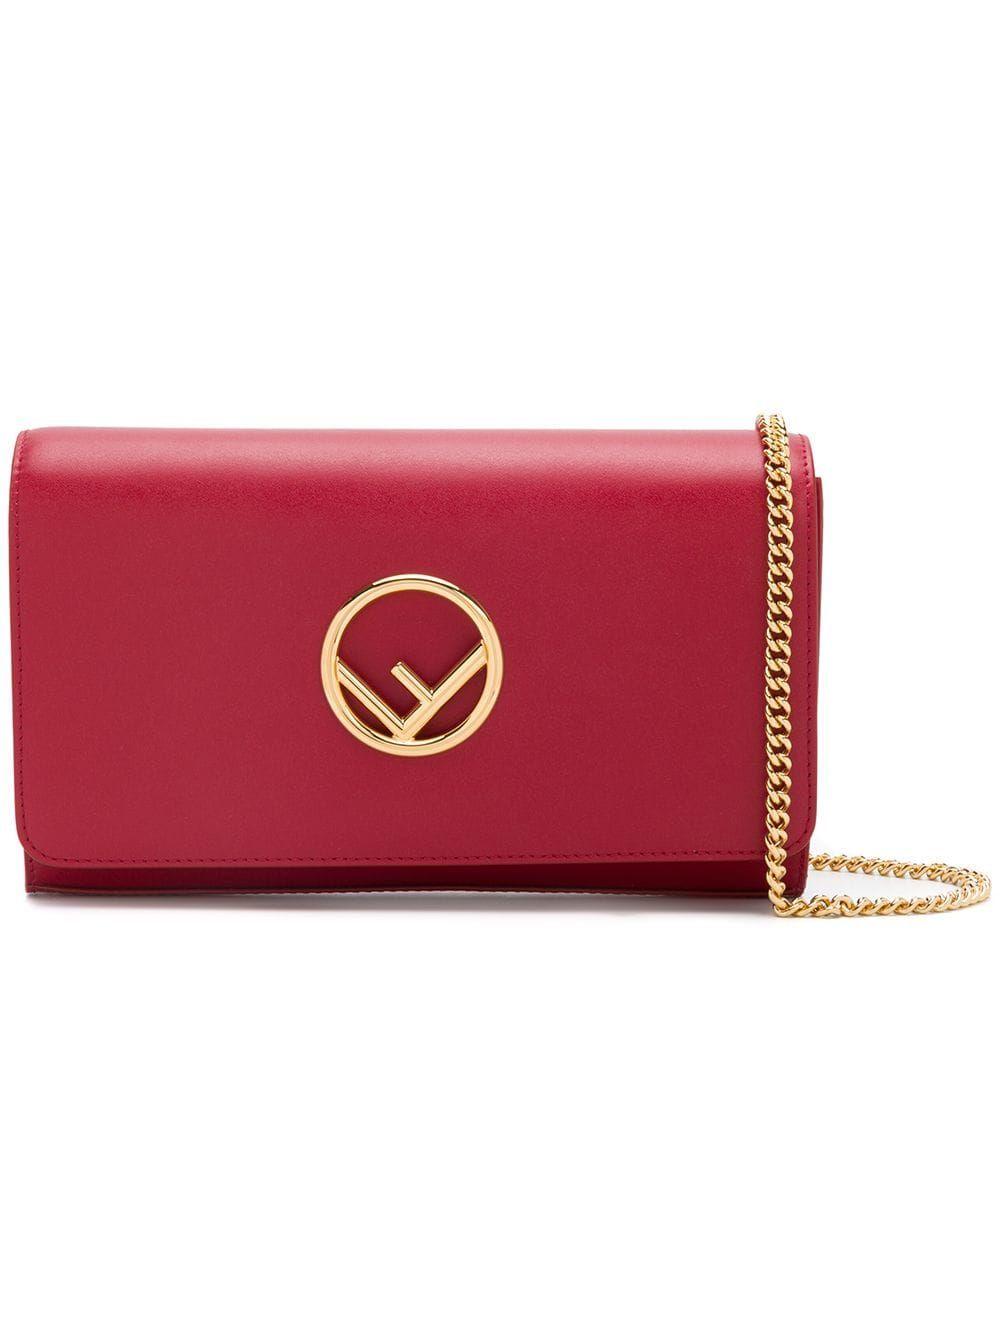 5b0eeae4b0 Fendi Kan I F wallet on chain - Red in 2019 | Products | Fendi mini ...